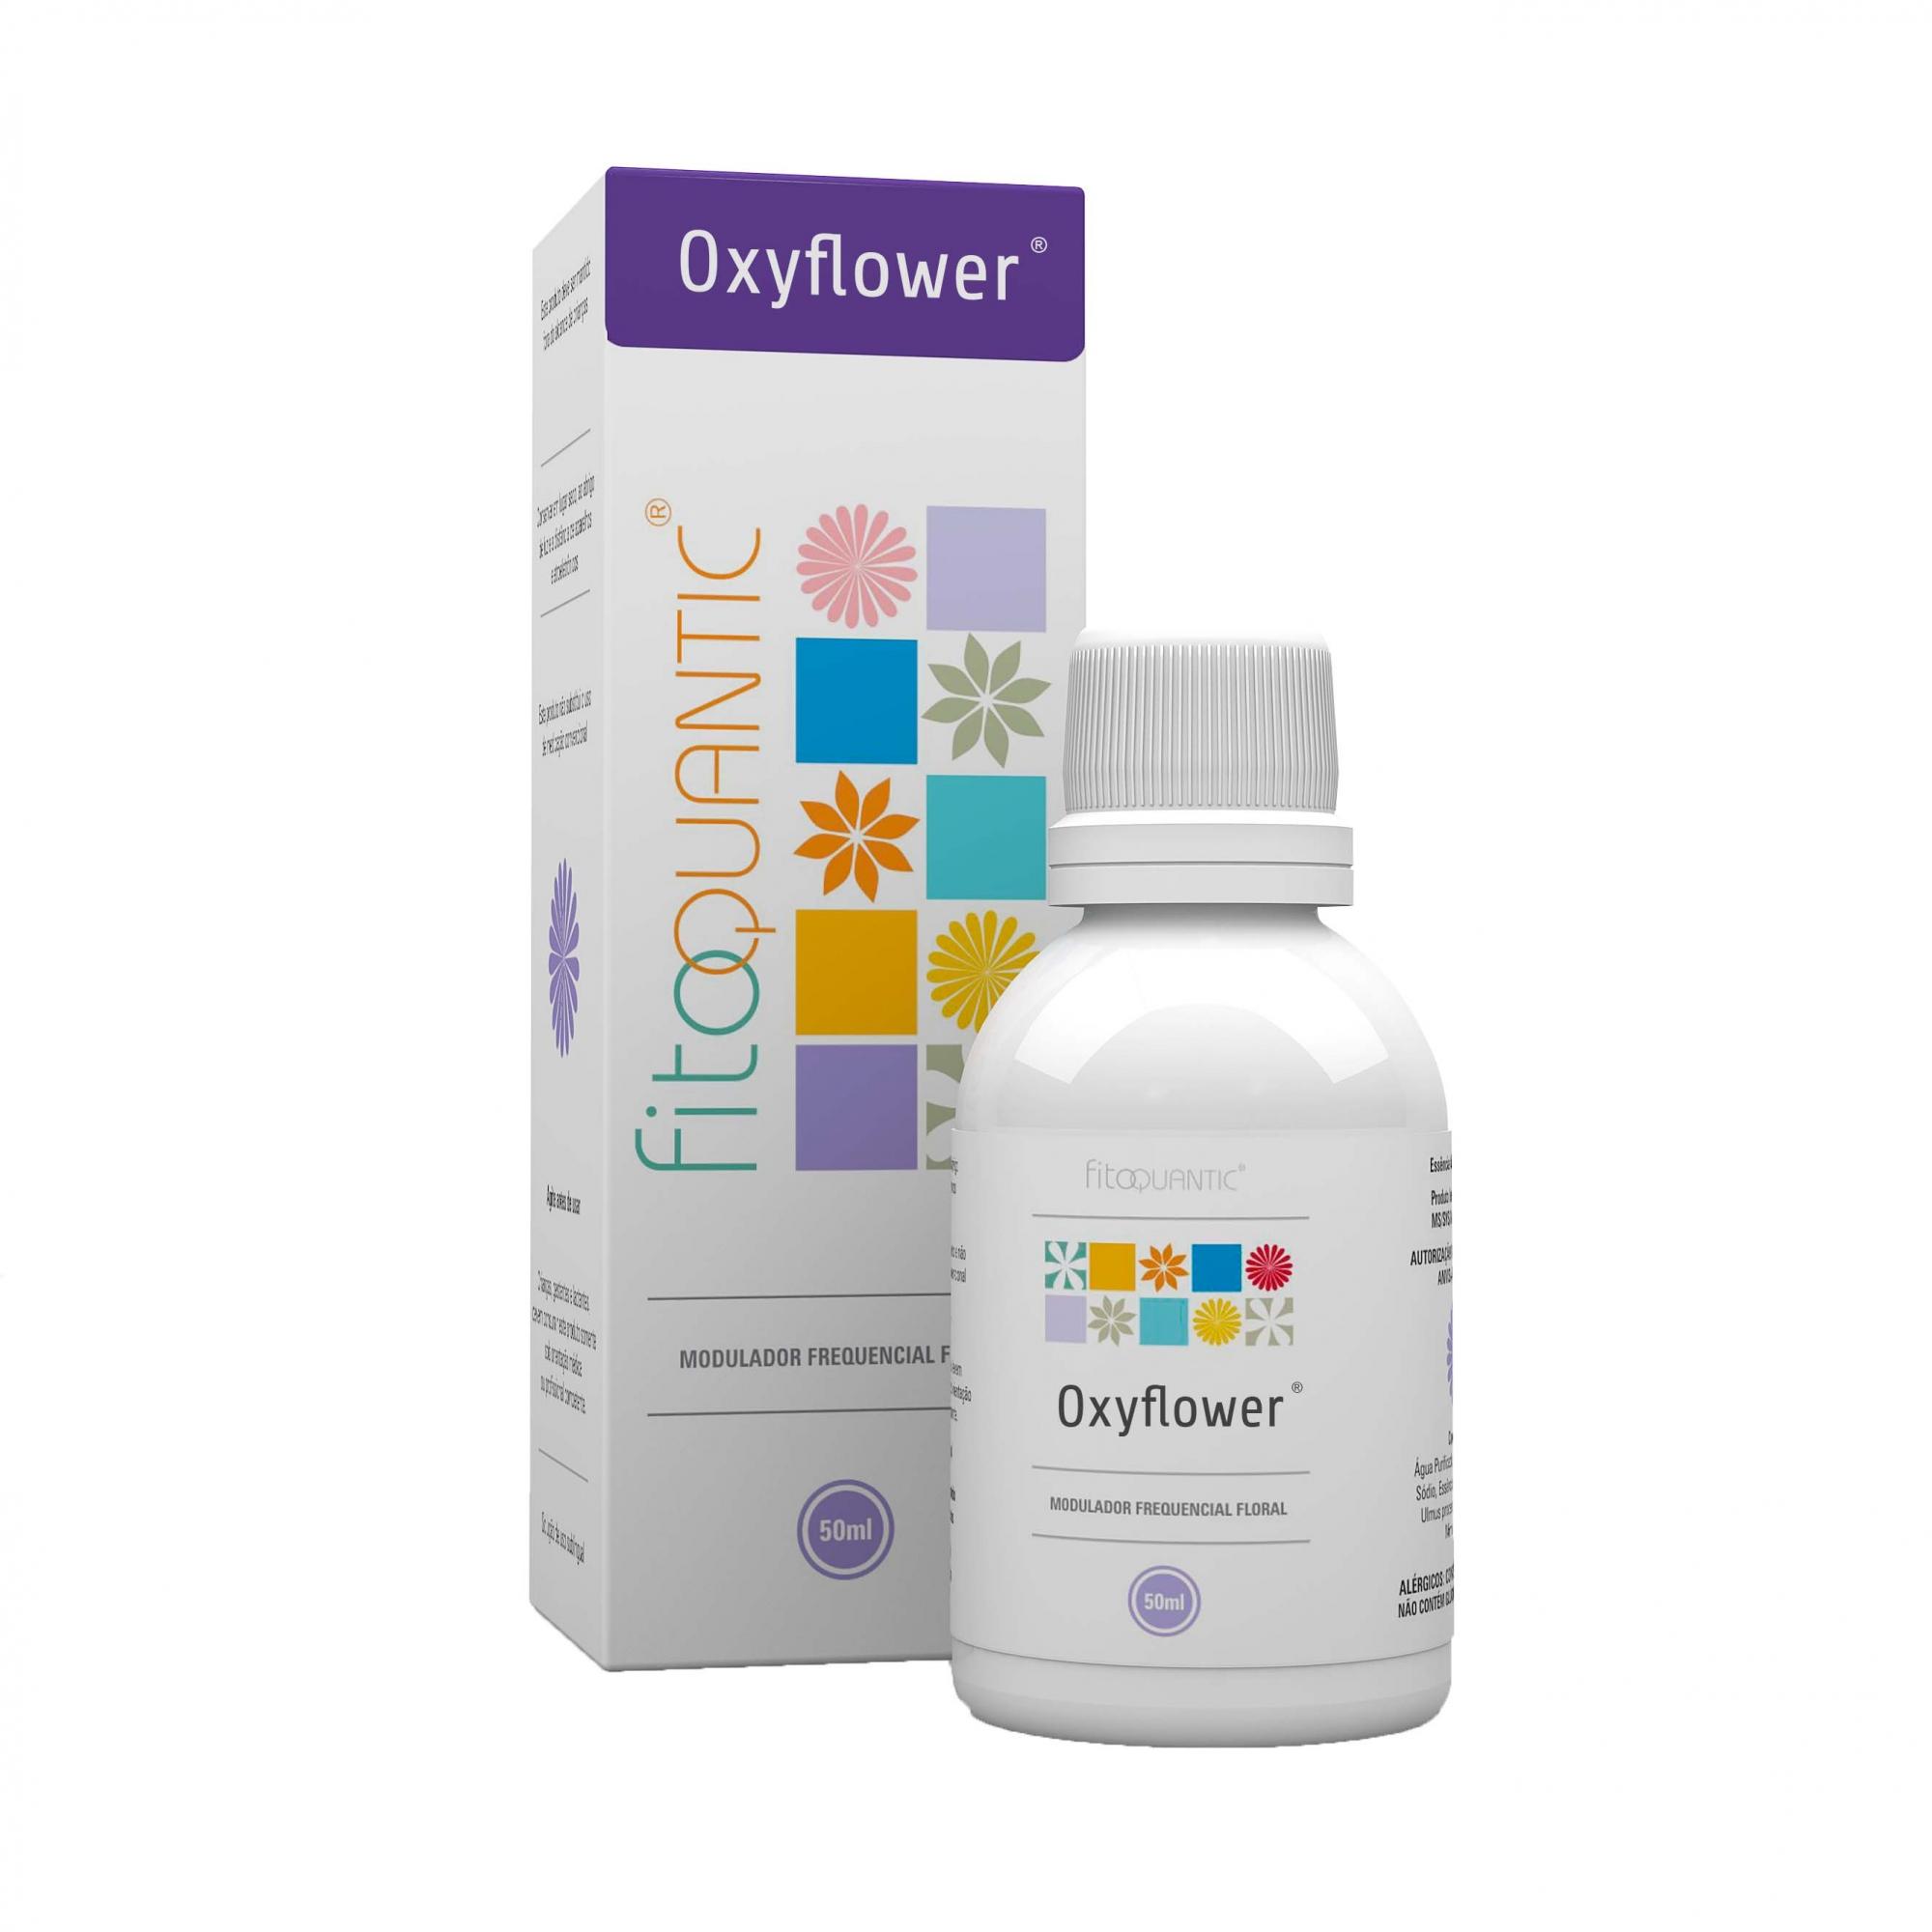 Fitoquantic Oxyflower 50ml Fisioquantic